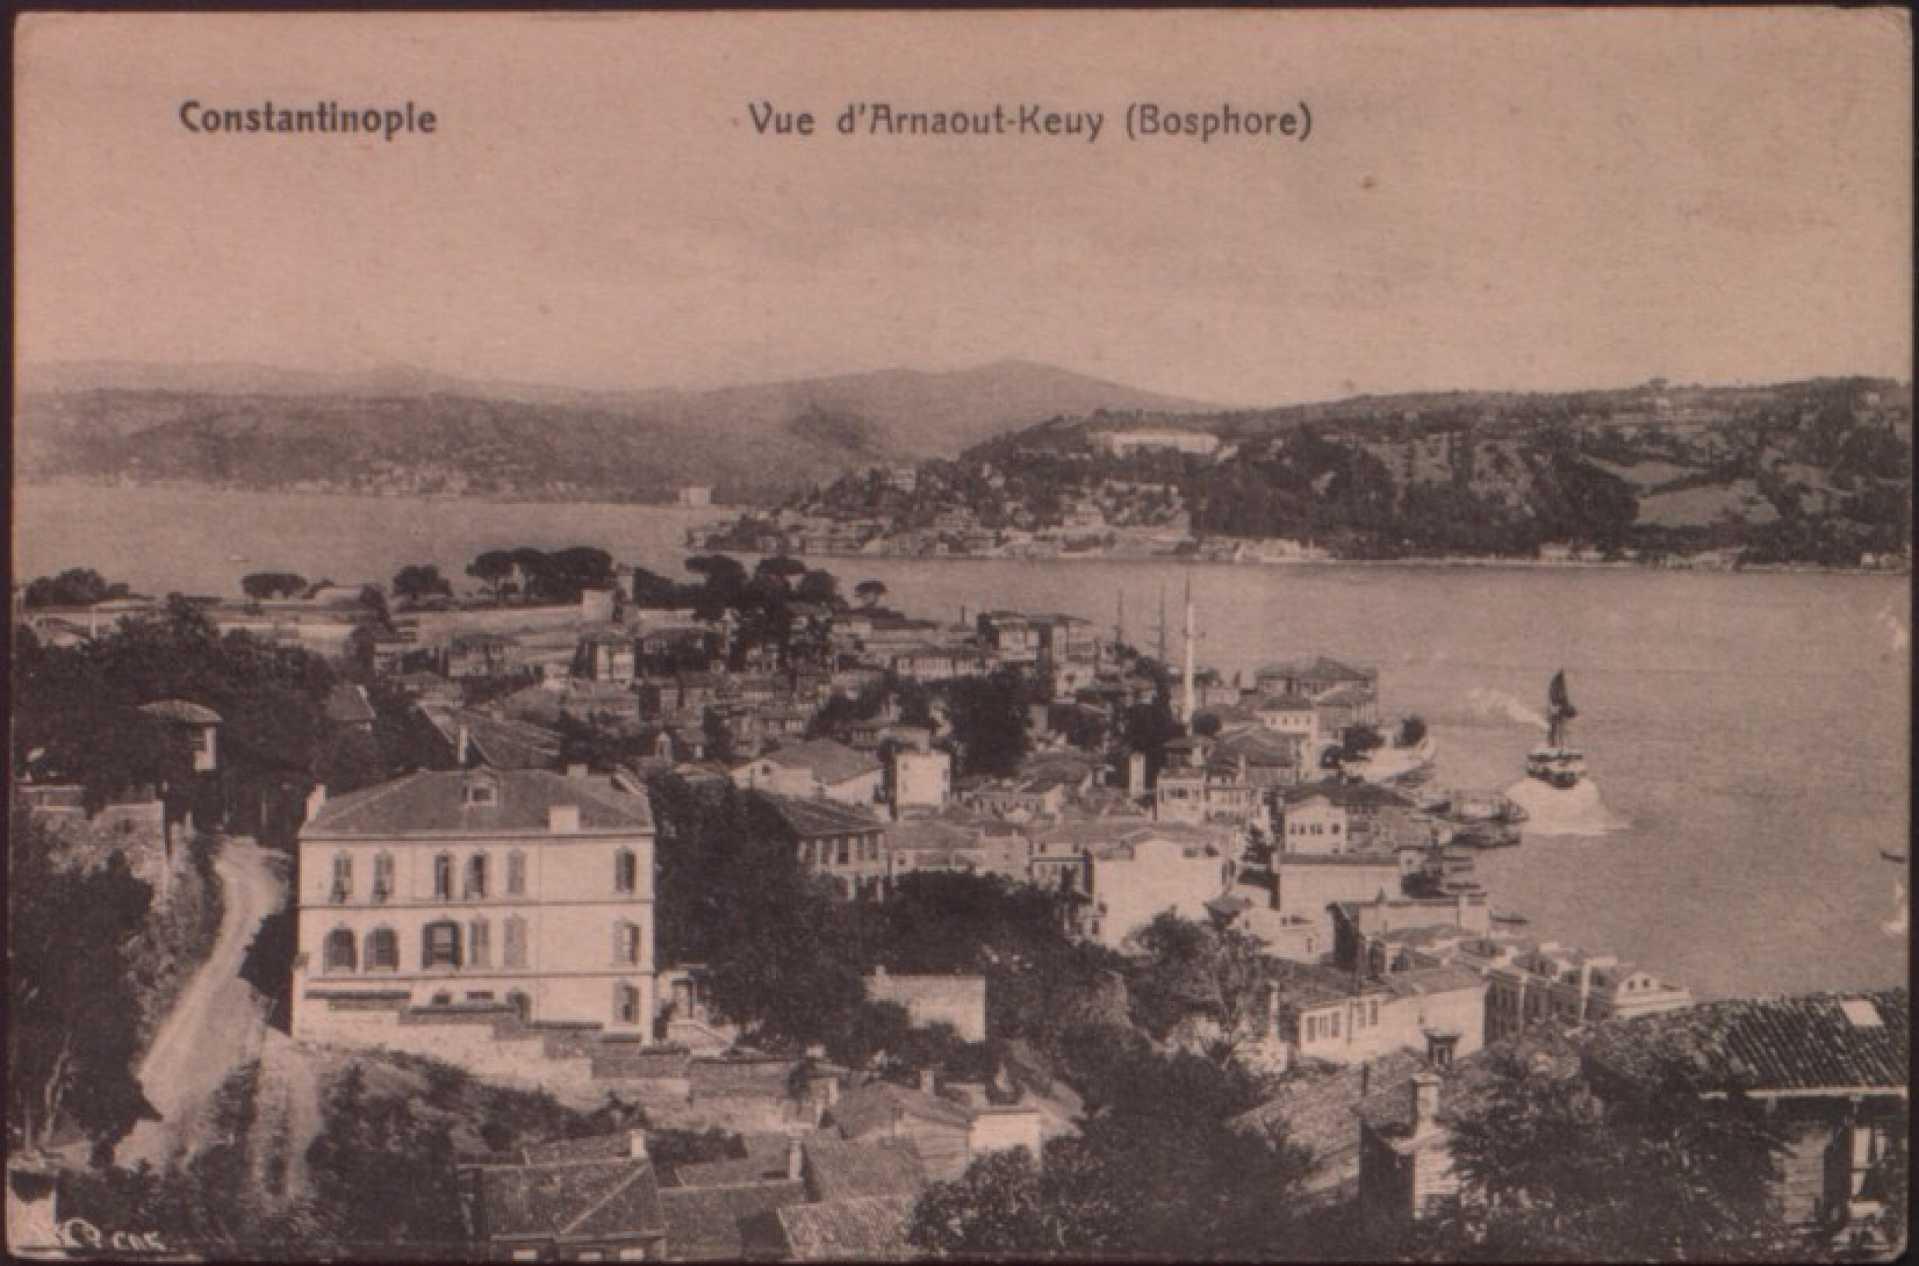 Vue d'Arnaout-Keuy (Bosphore)